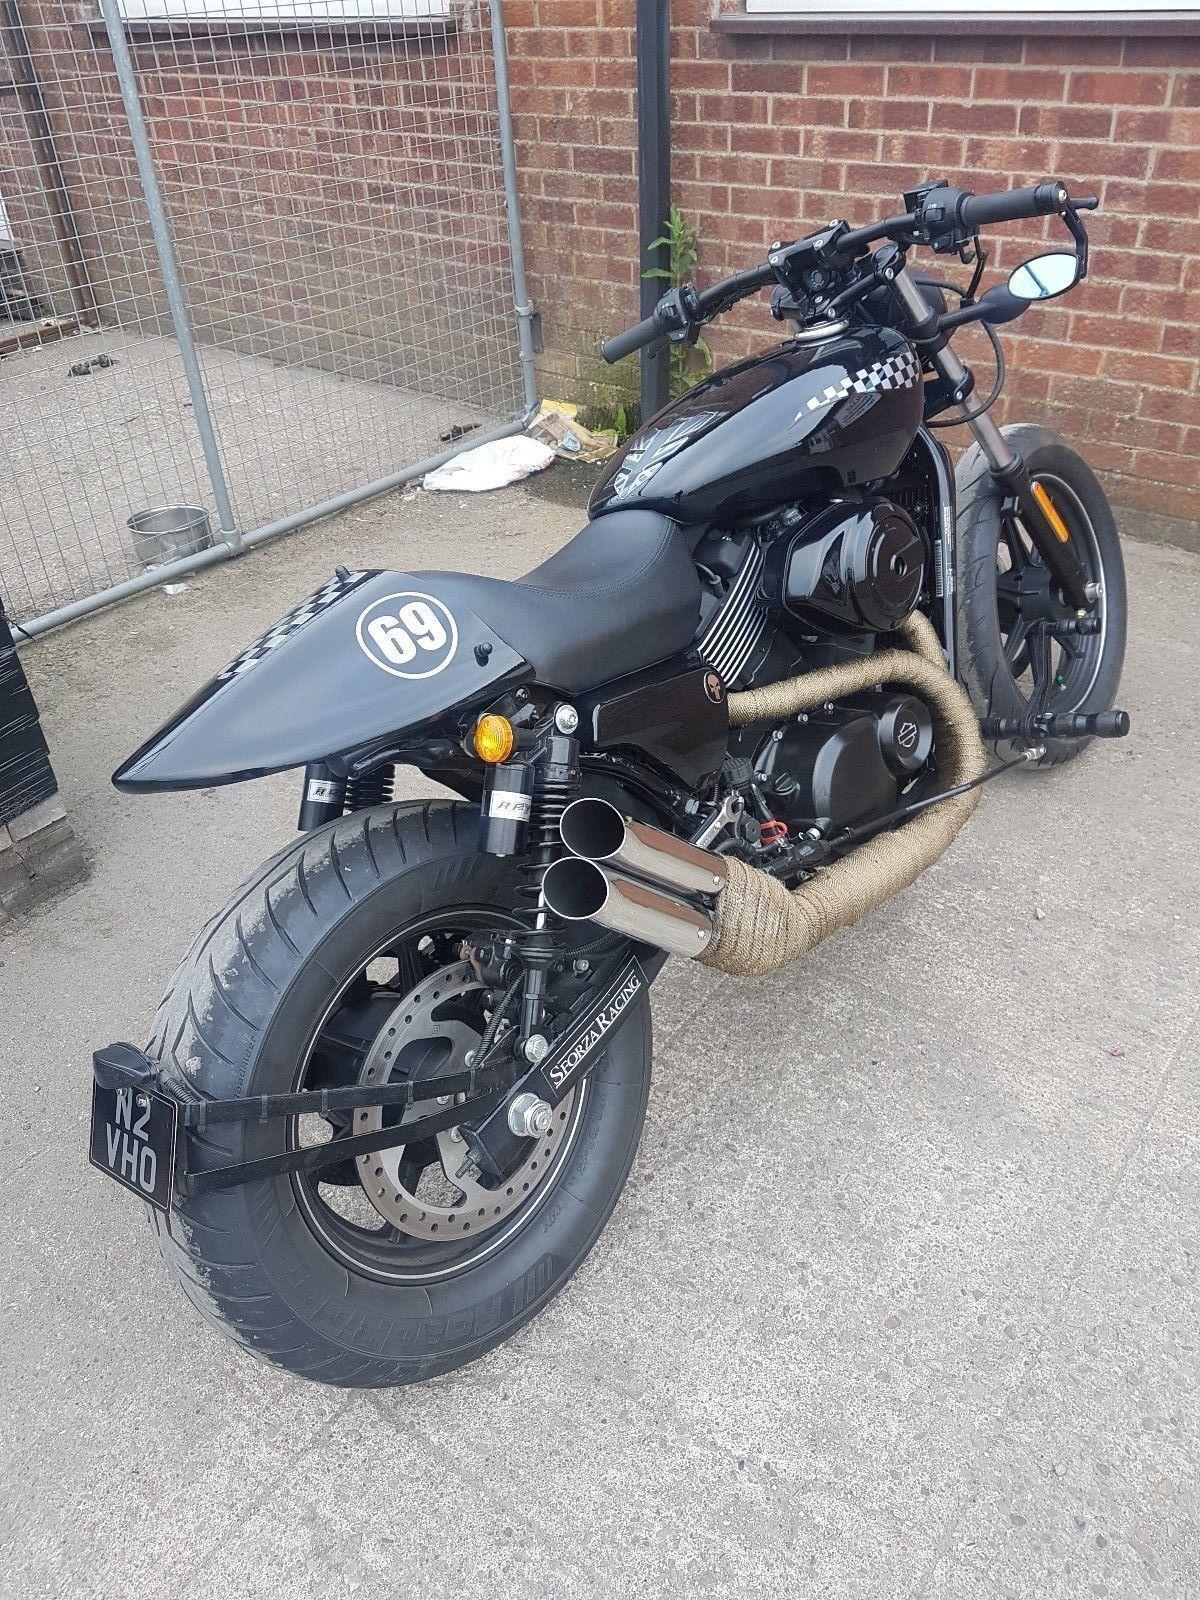 Harley Davidson Custom Street Xg750 Cafe Racer 2016 Harley Davidson Bikes Harley Davidson Street Harley Davidson Helmets